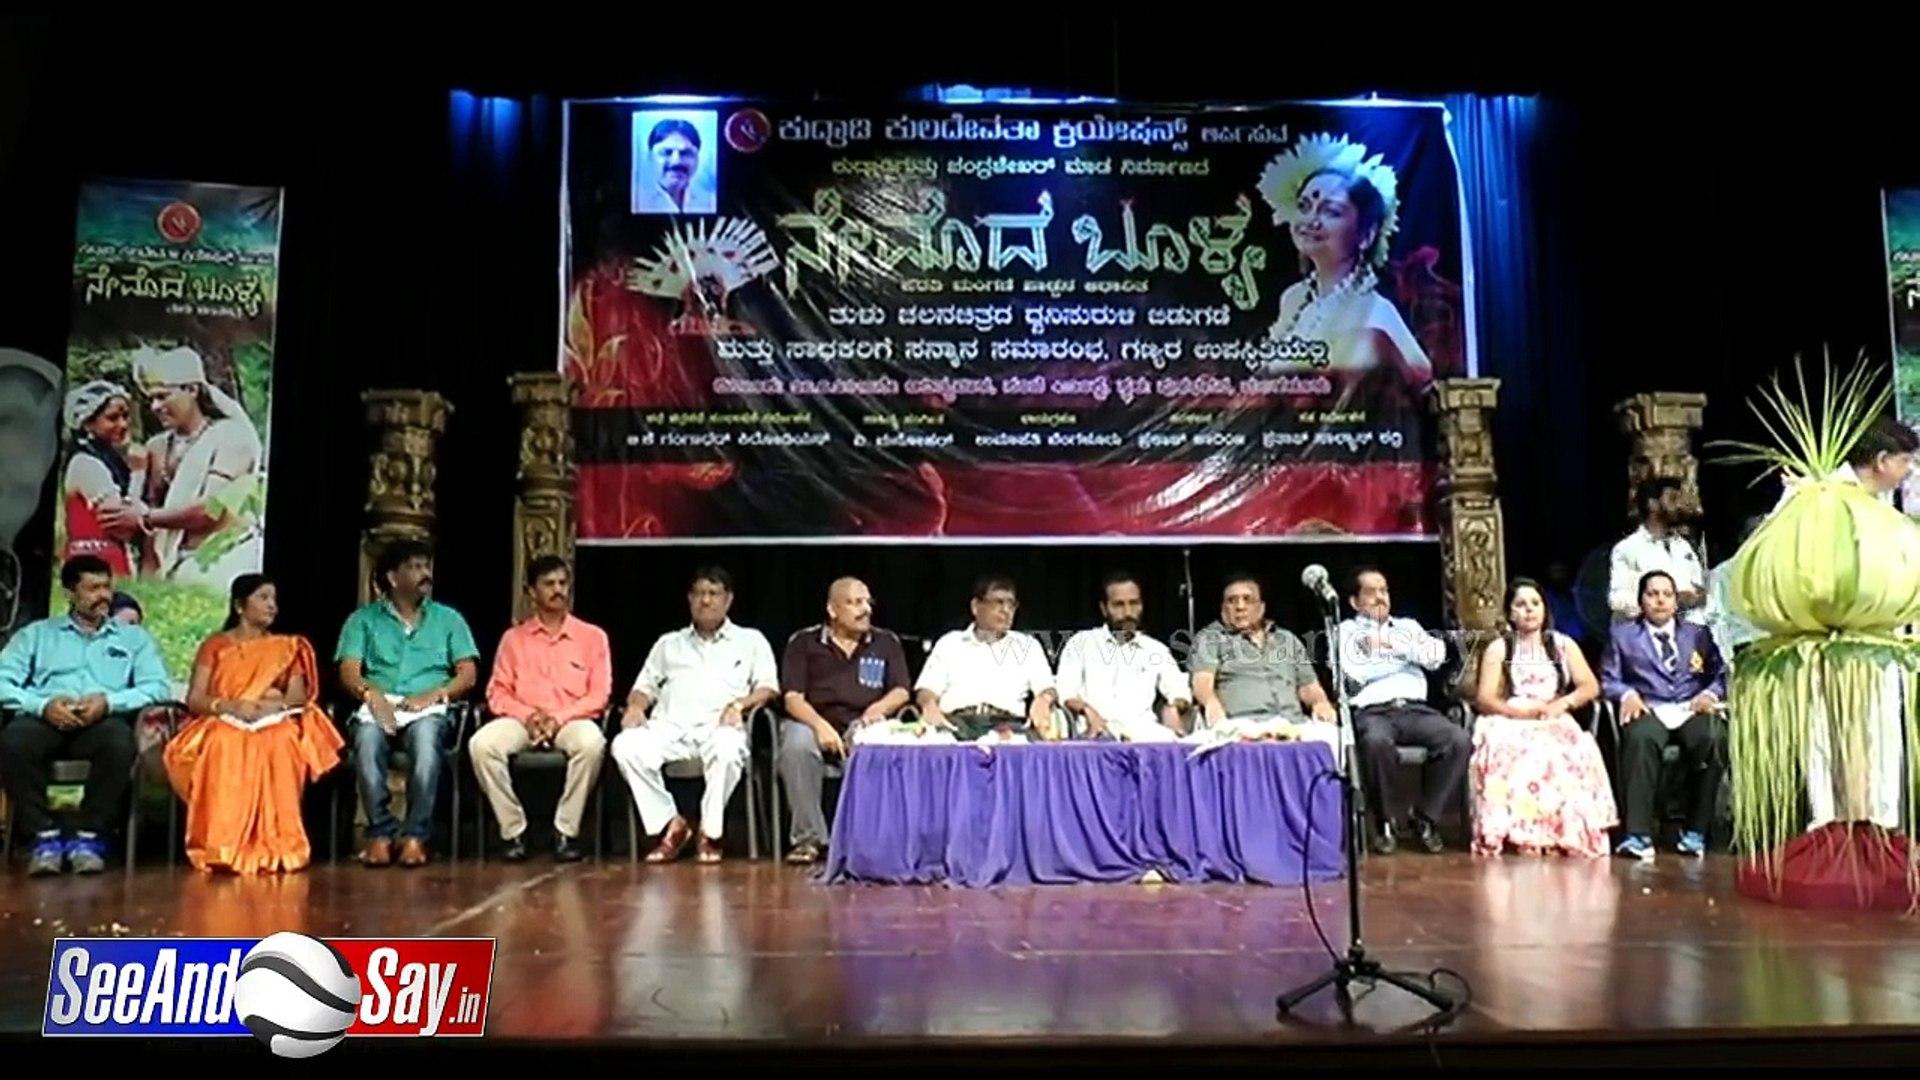 Nemoda Boolya || Tulu Movie || Music released in Town Hall on June 26